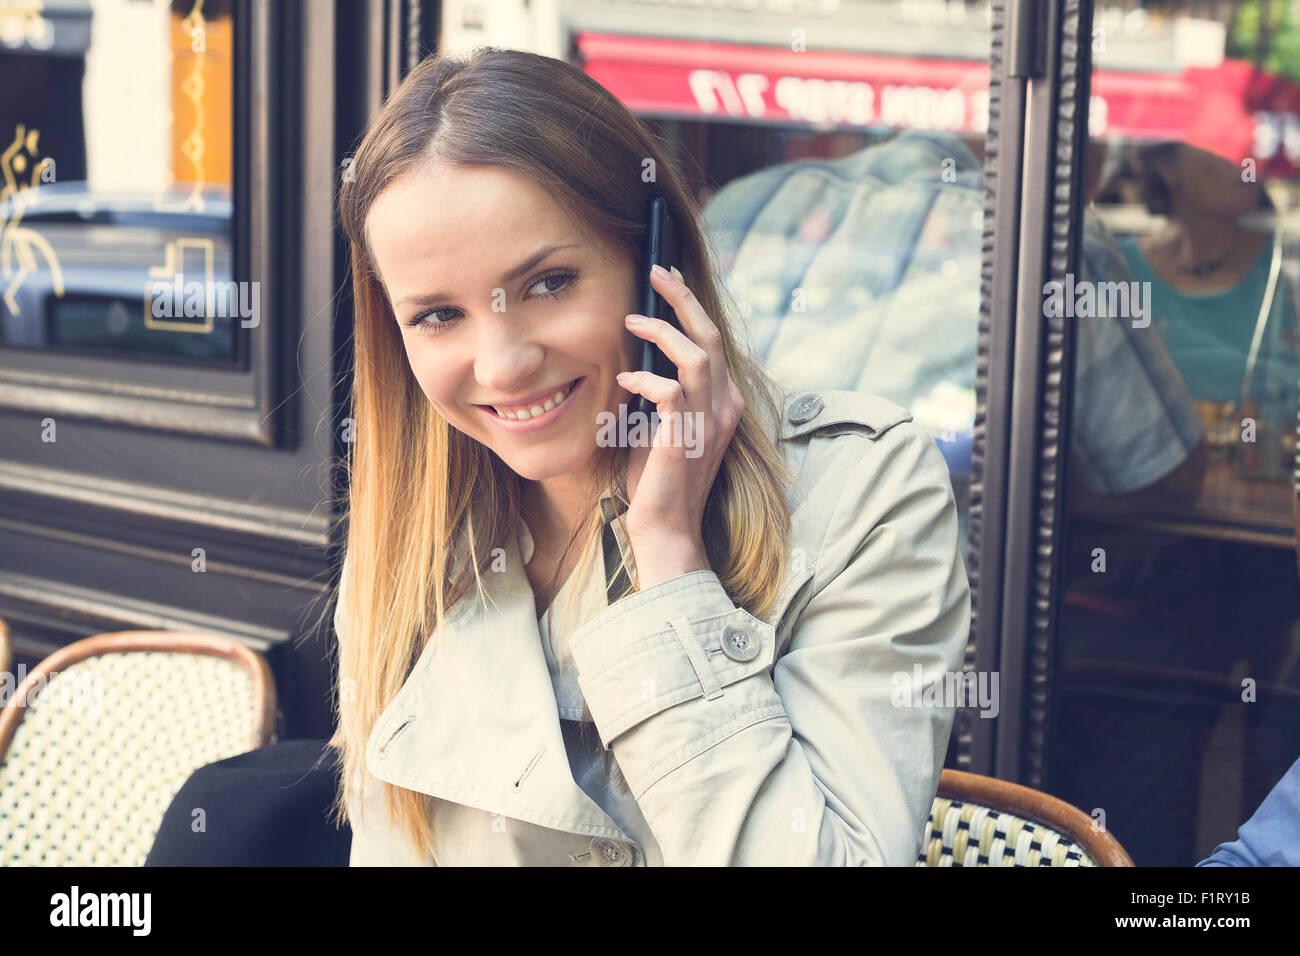 Paris, Woman talking on the phone - Stock Image